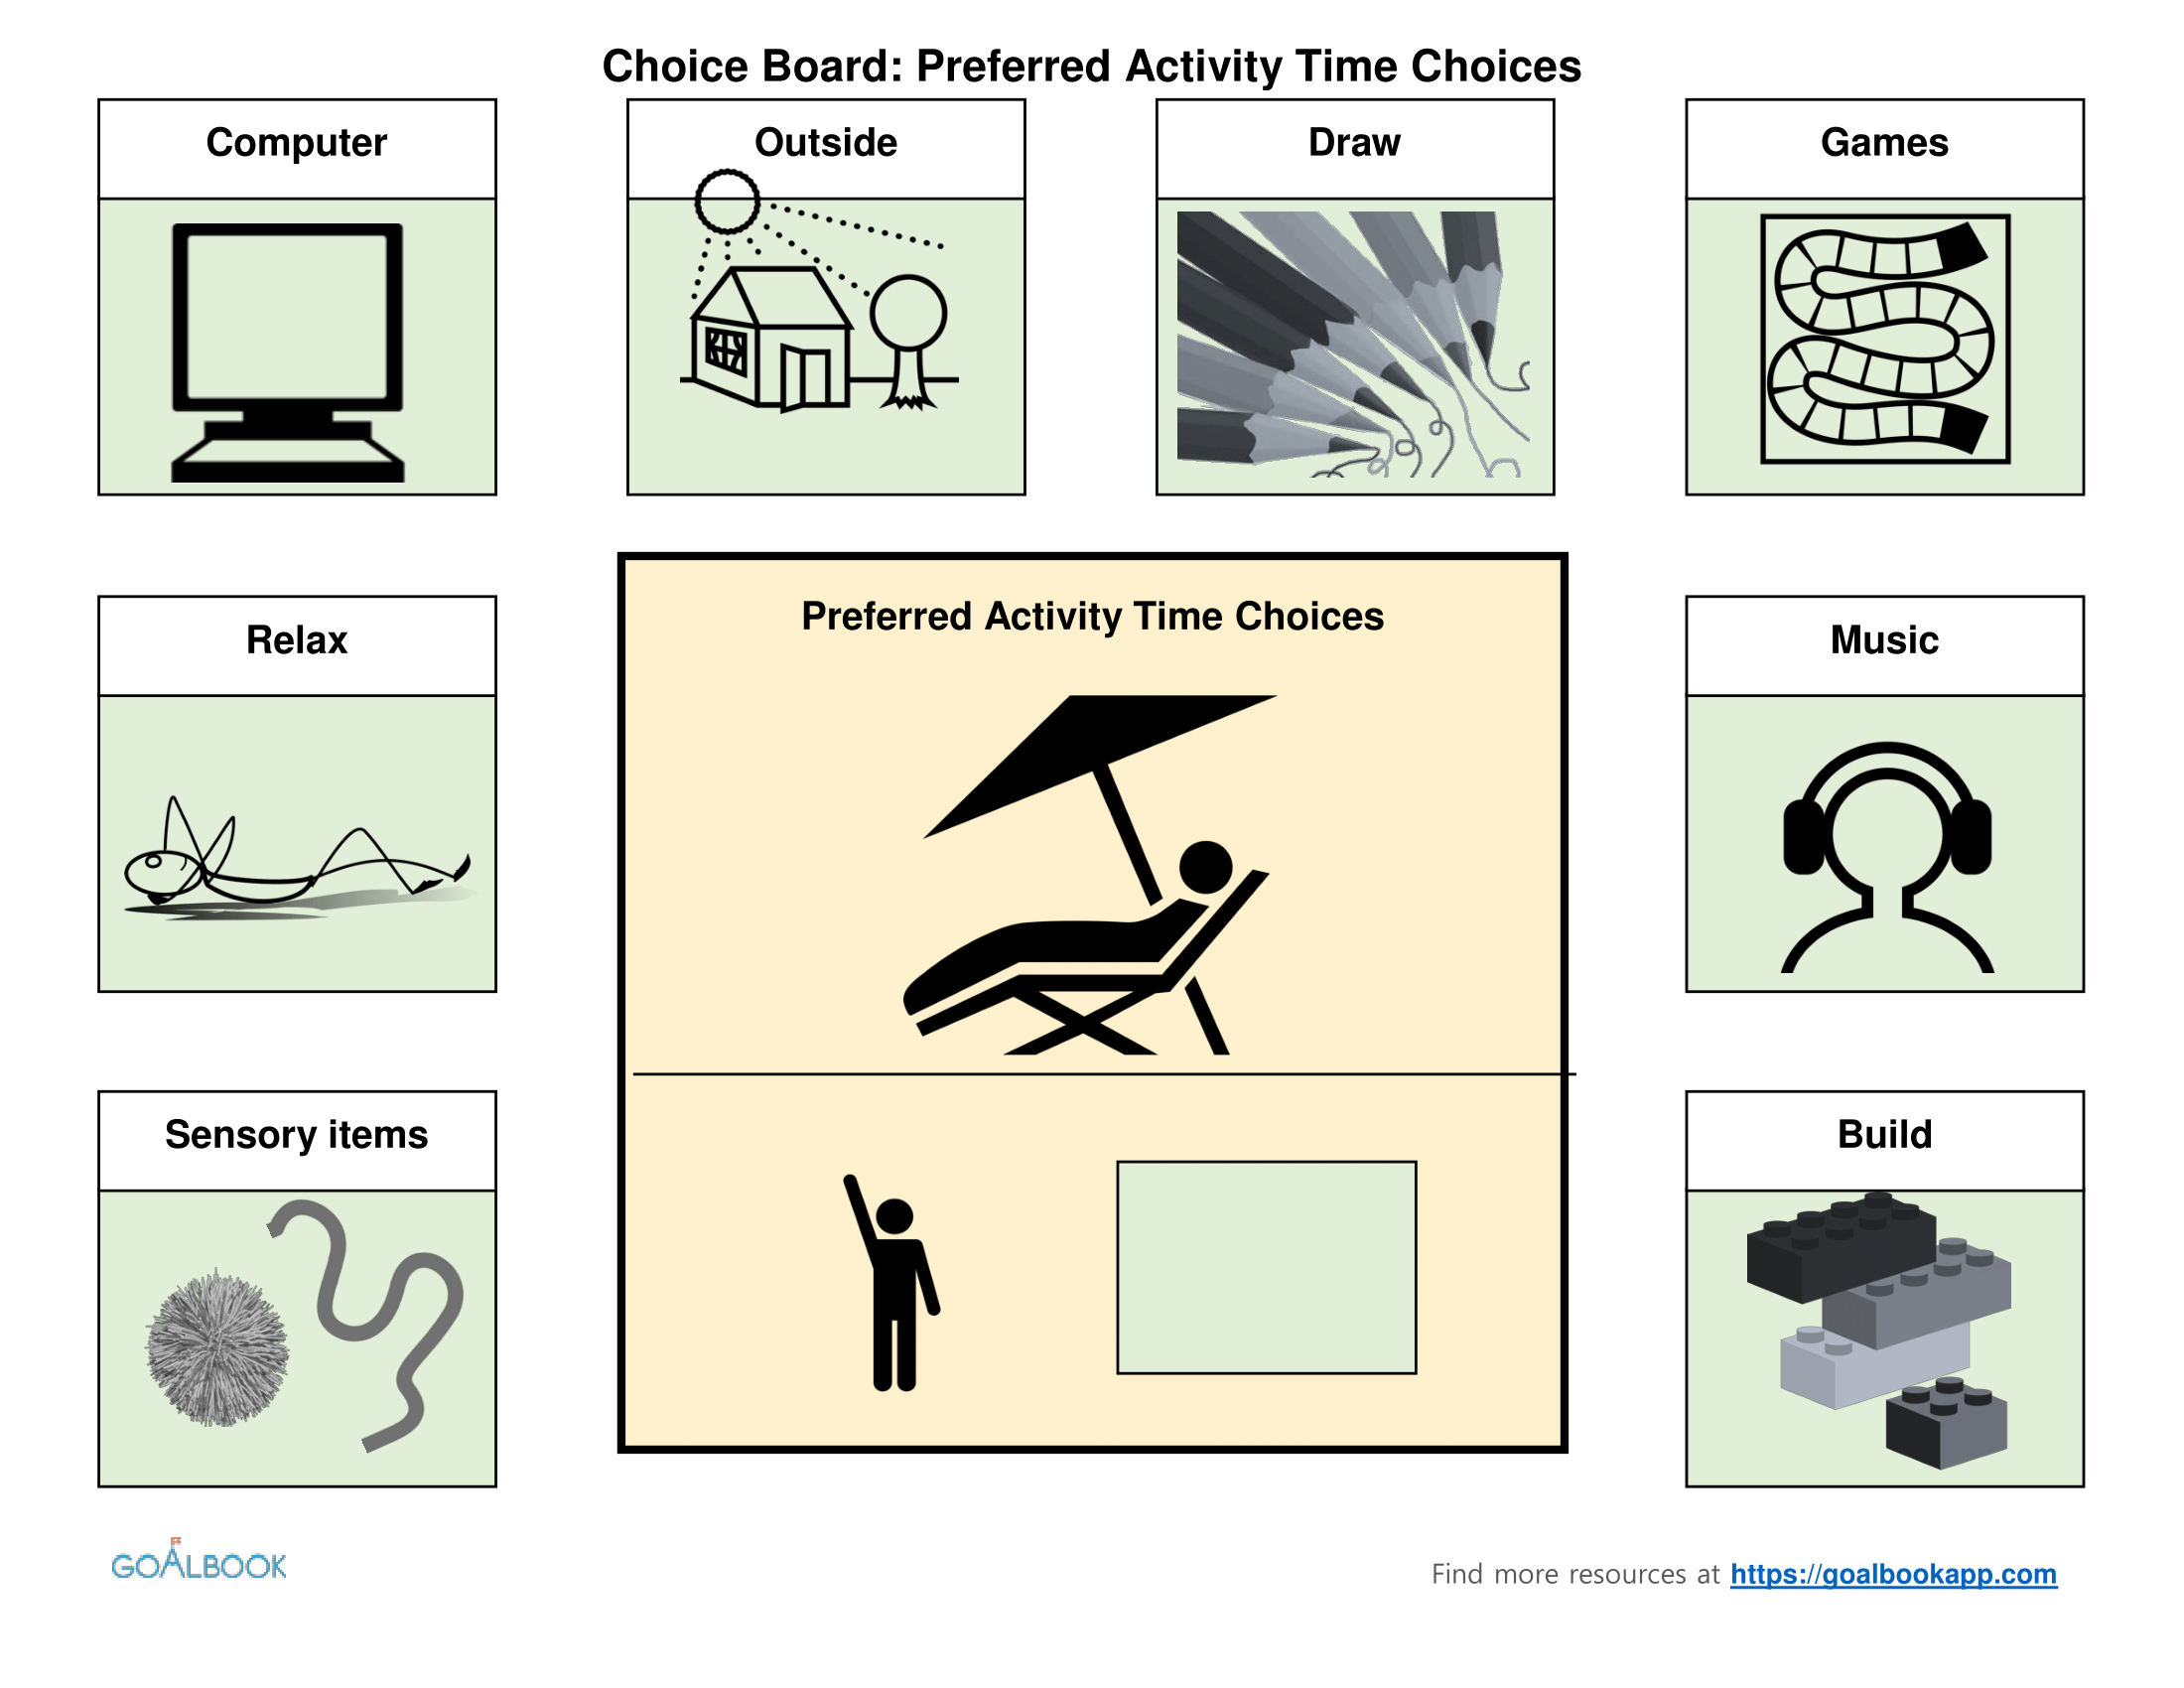 Preferred Activity Choice Board